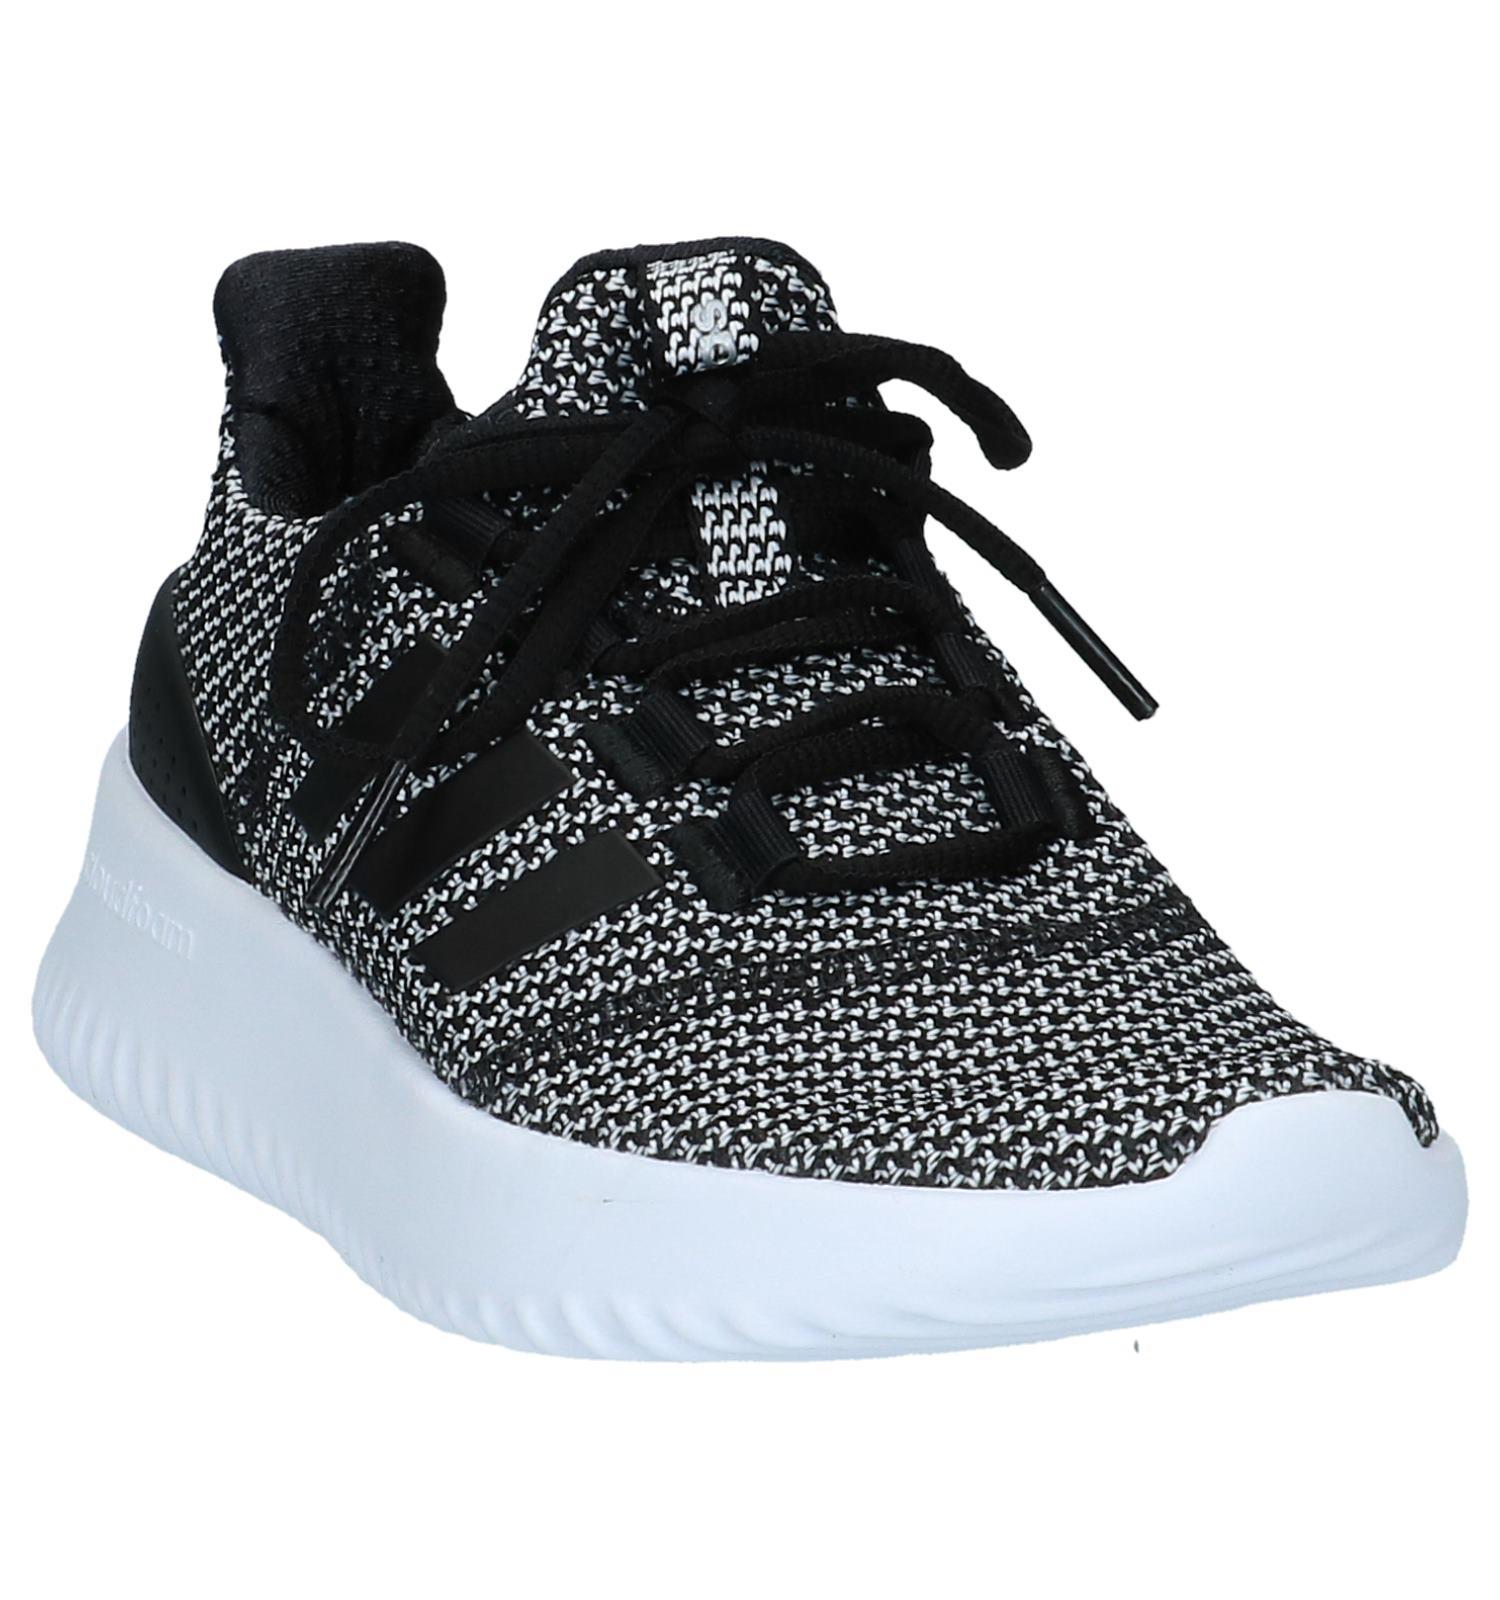 8879a1b6771 Sneakers Grijs adidas Cloudfoam Ultimate | TORFS.BE | Gratis verzend en  retour